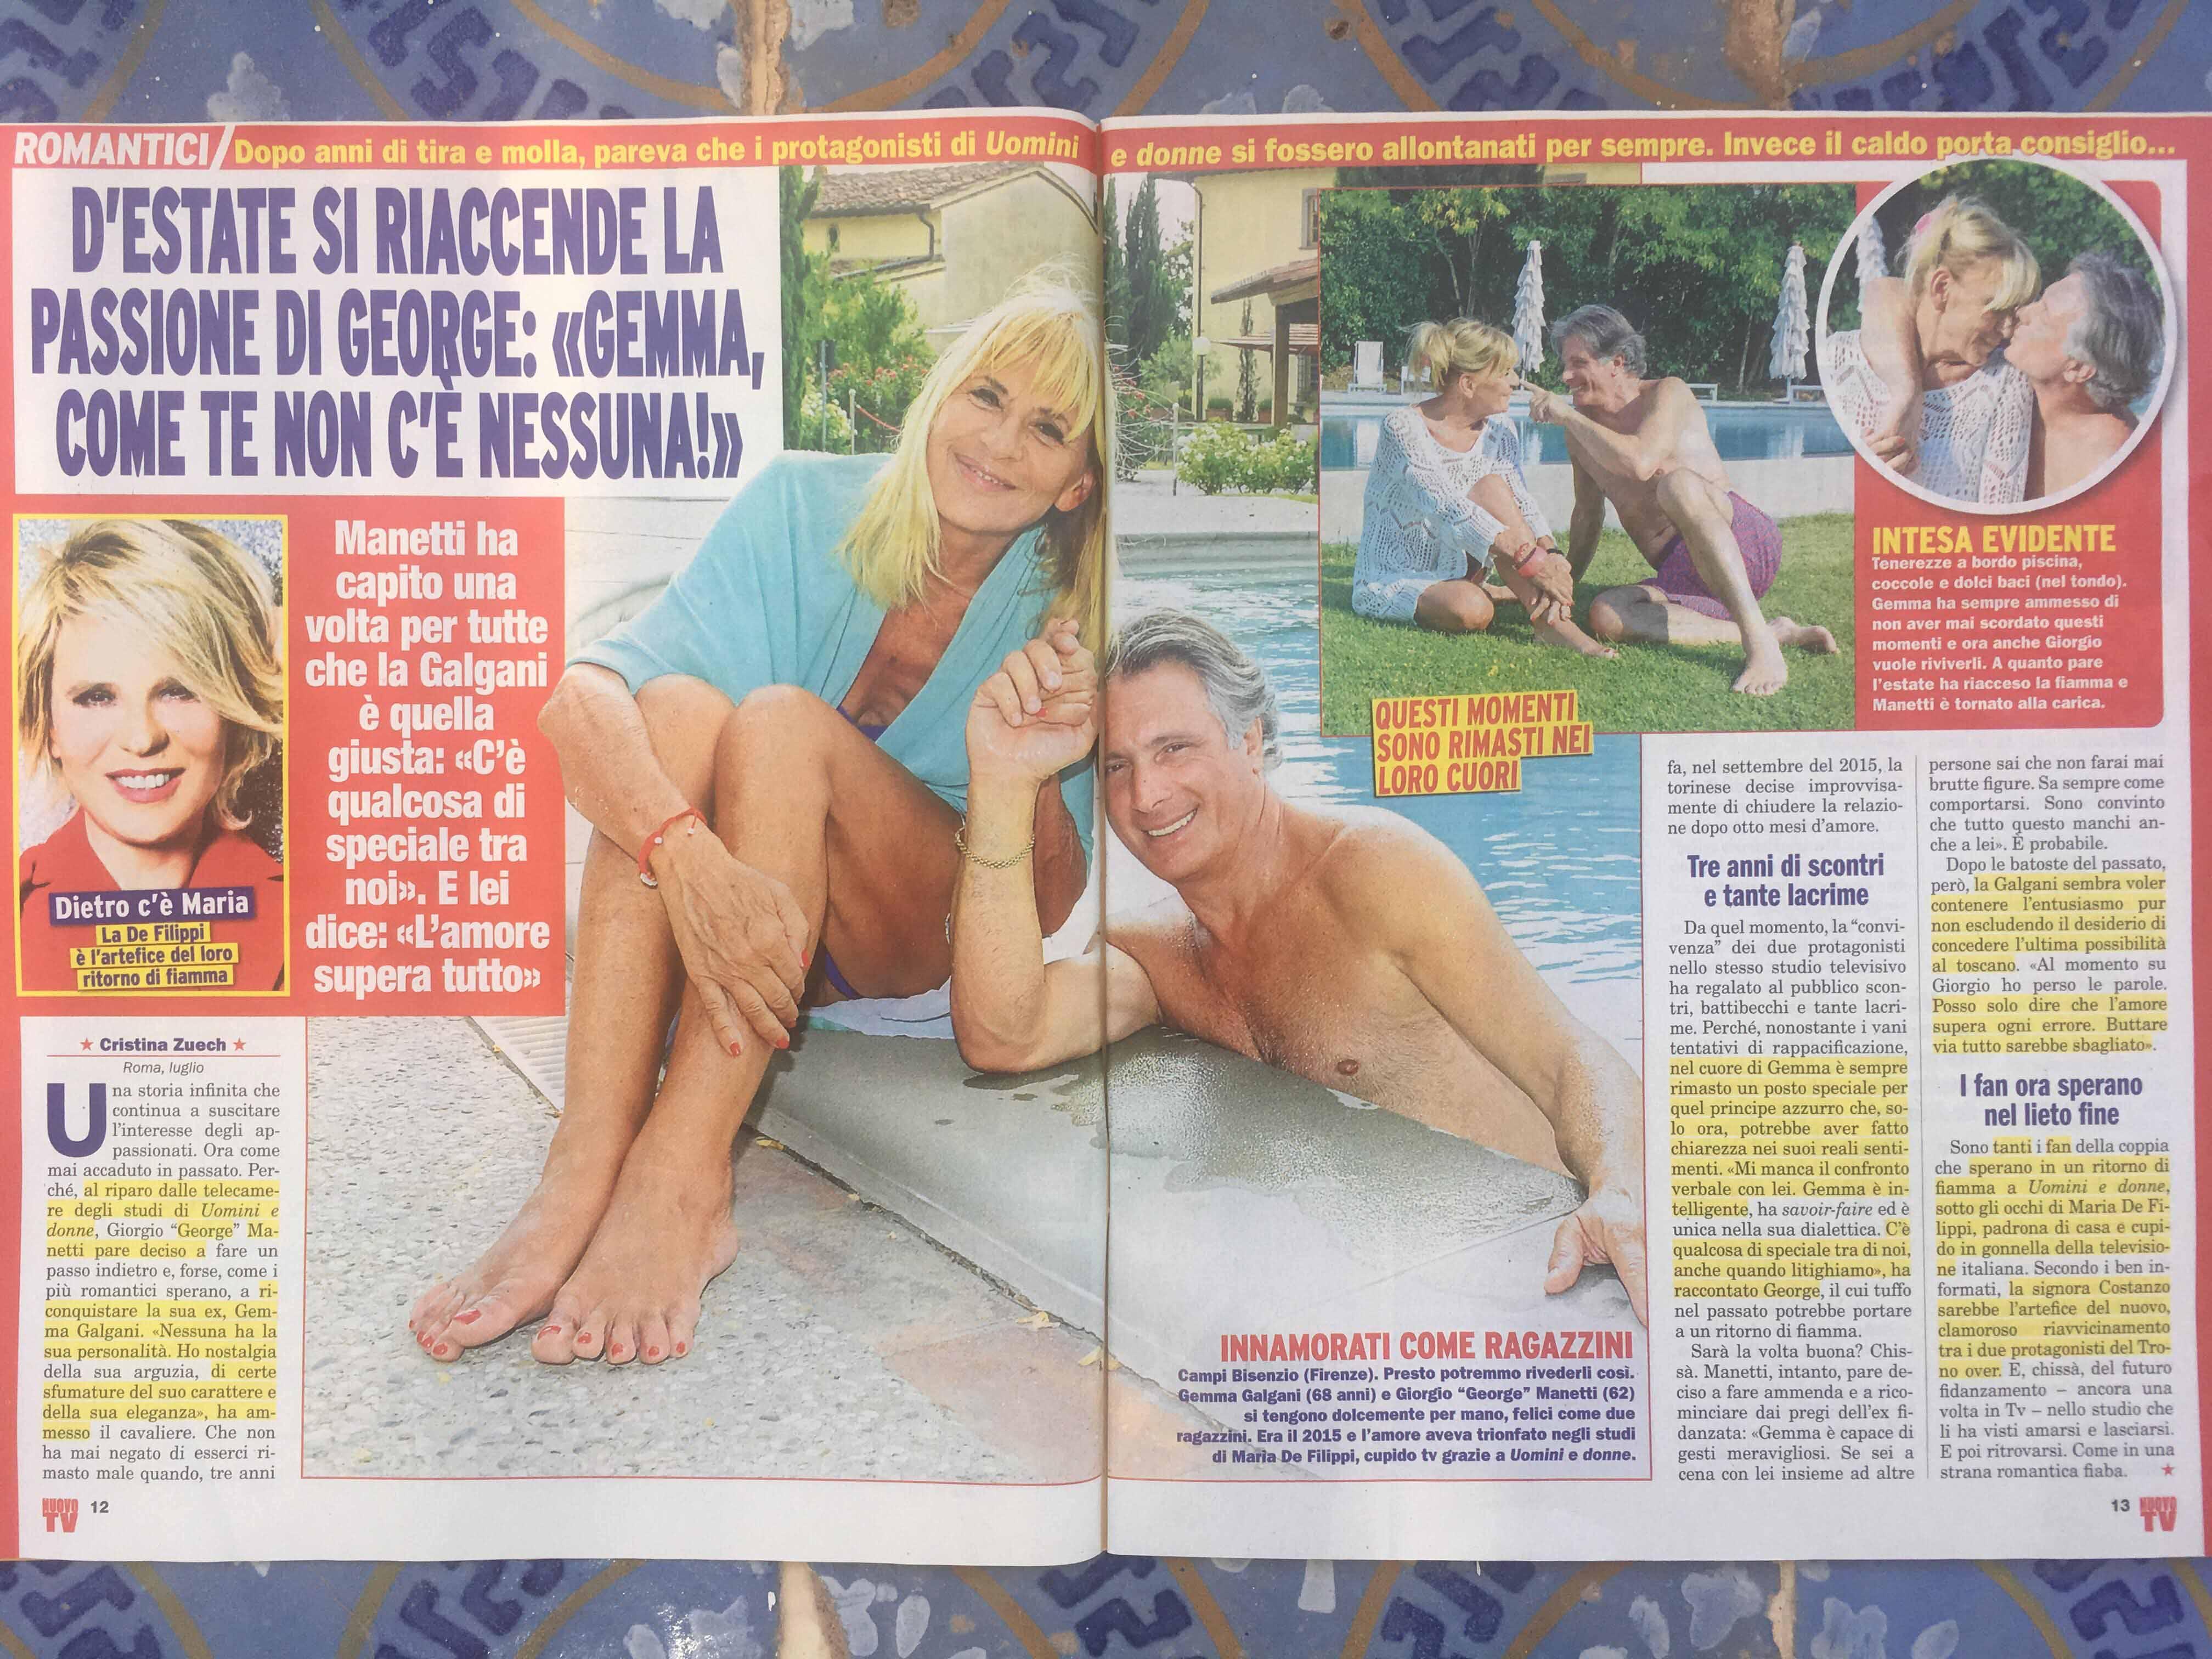 Gemma e George l'amore rinasce 2018 (1)